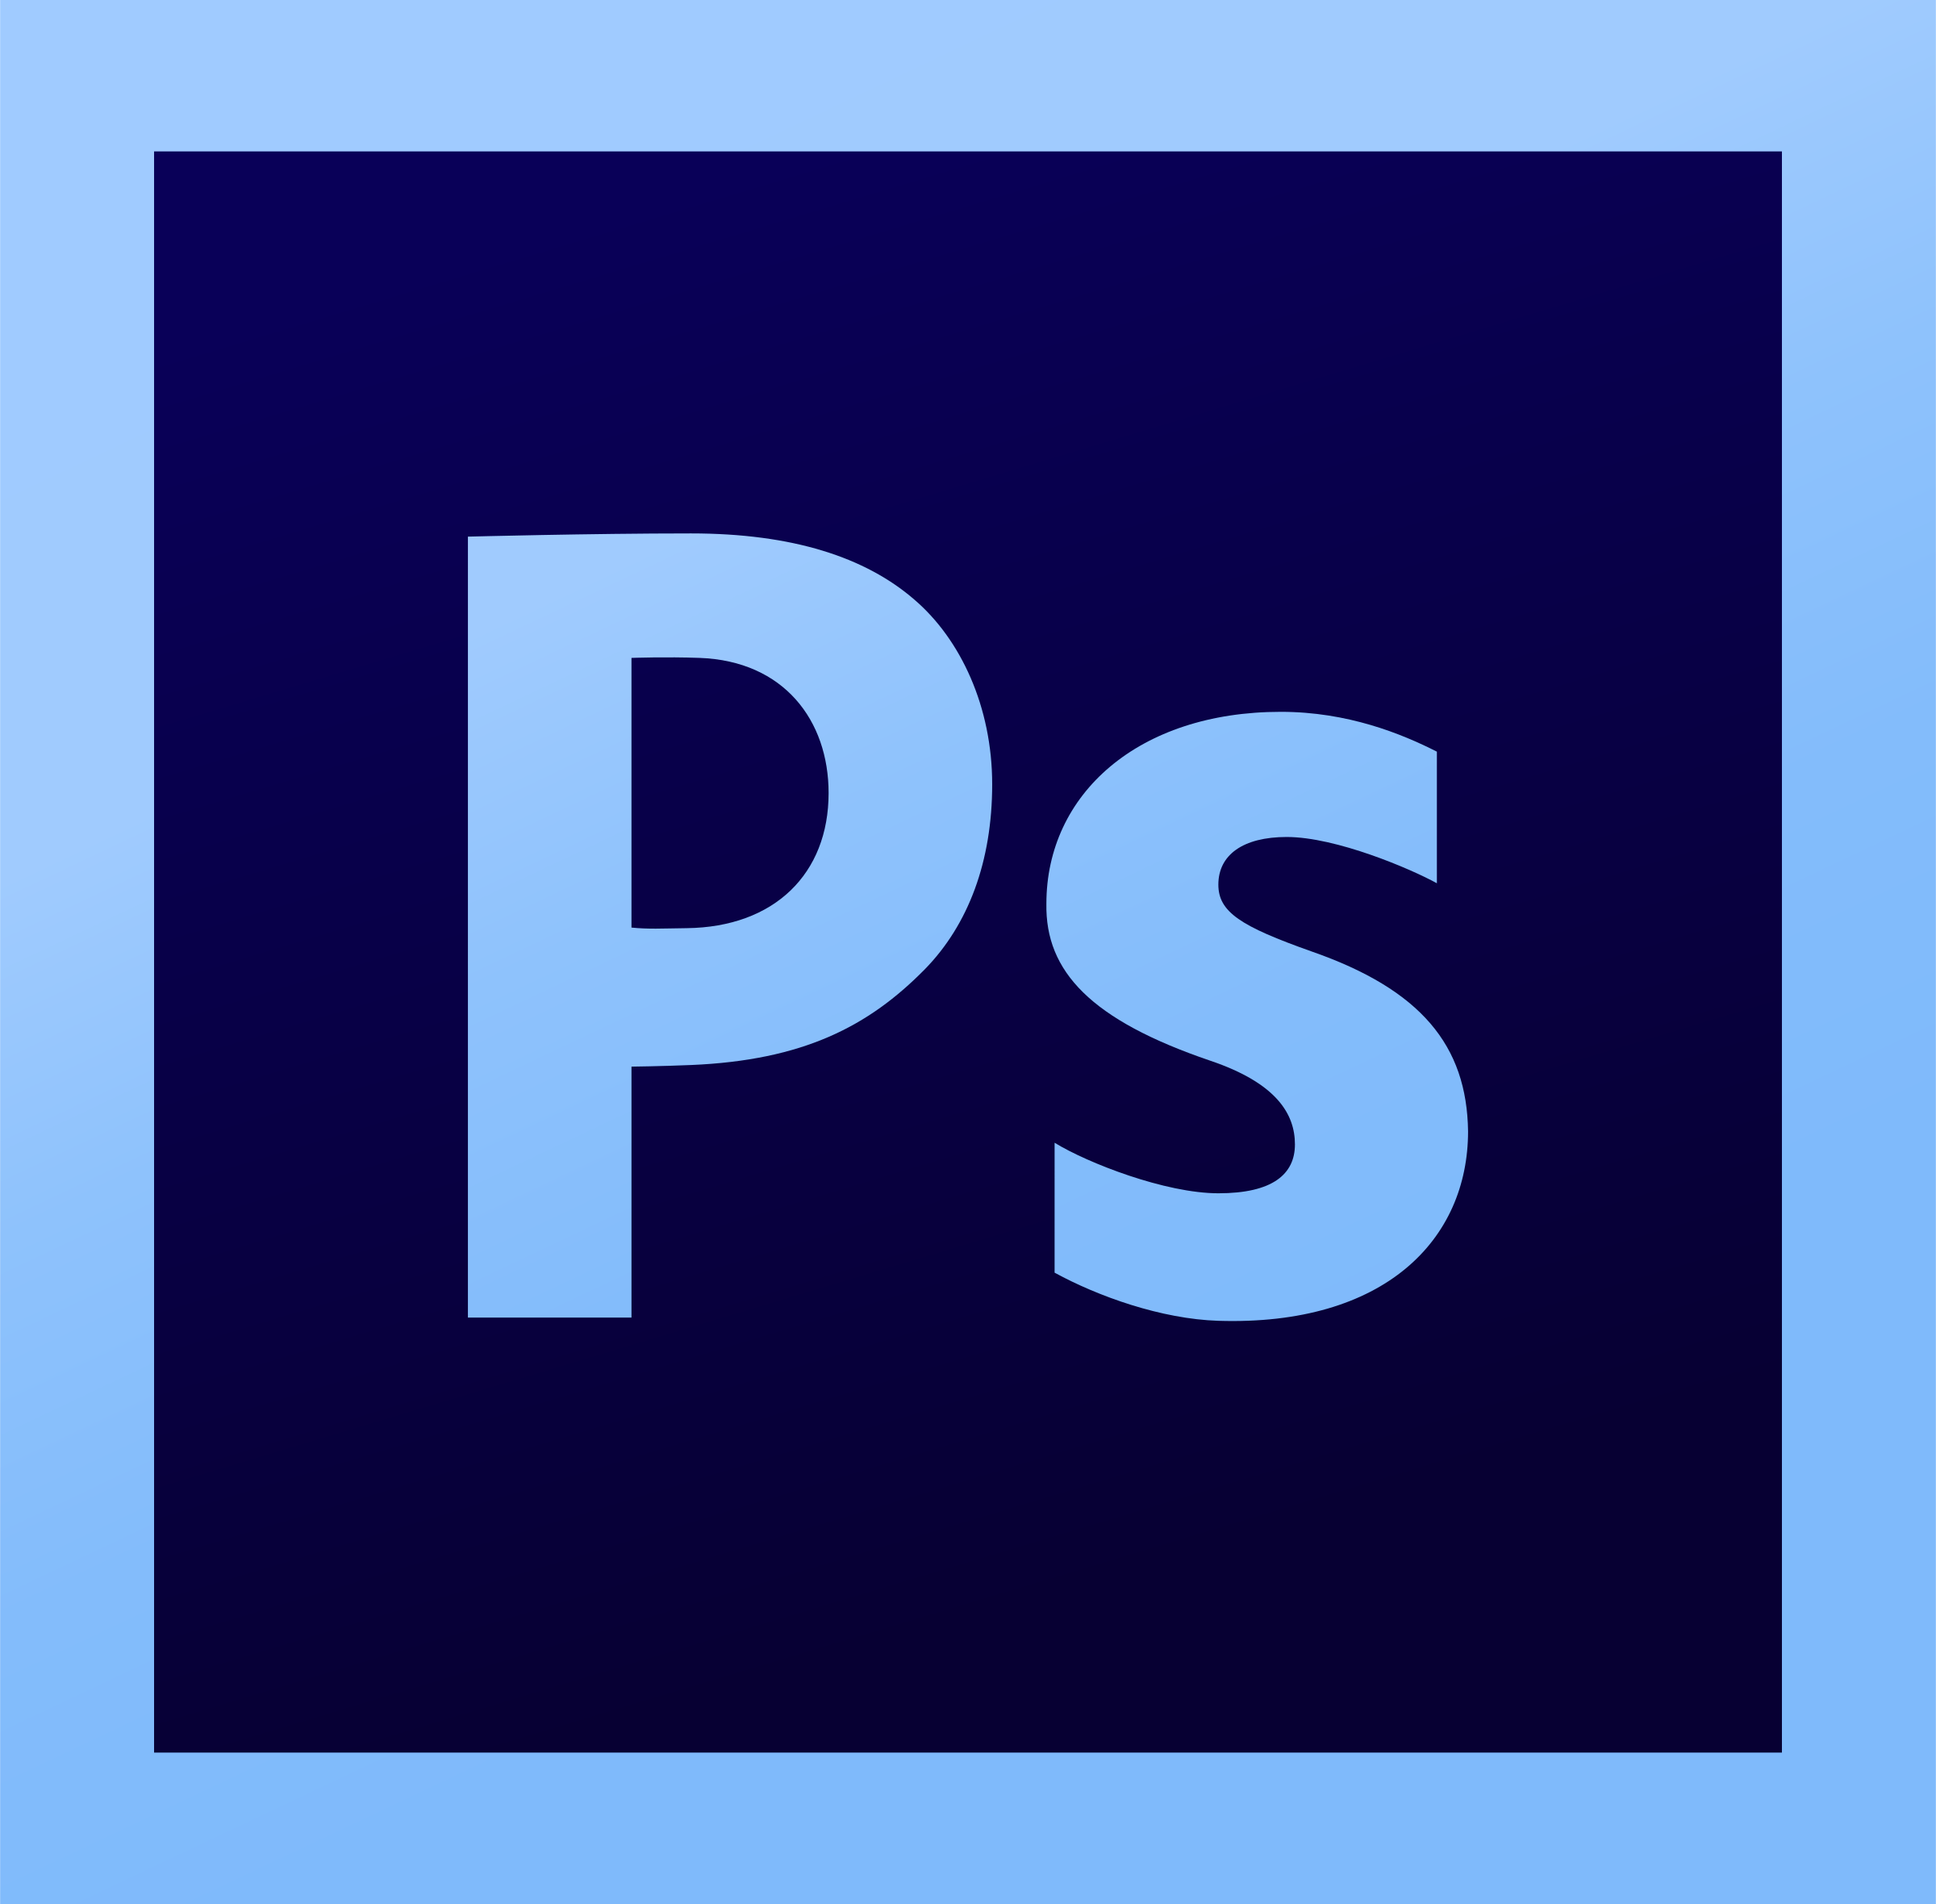 adobe photoshop cs6 logo png transparent svg vector freebie supply